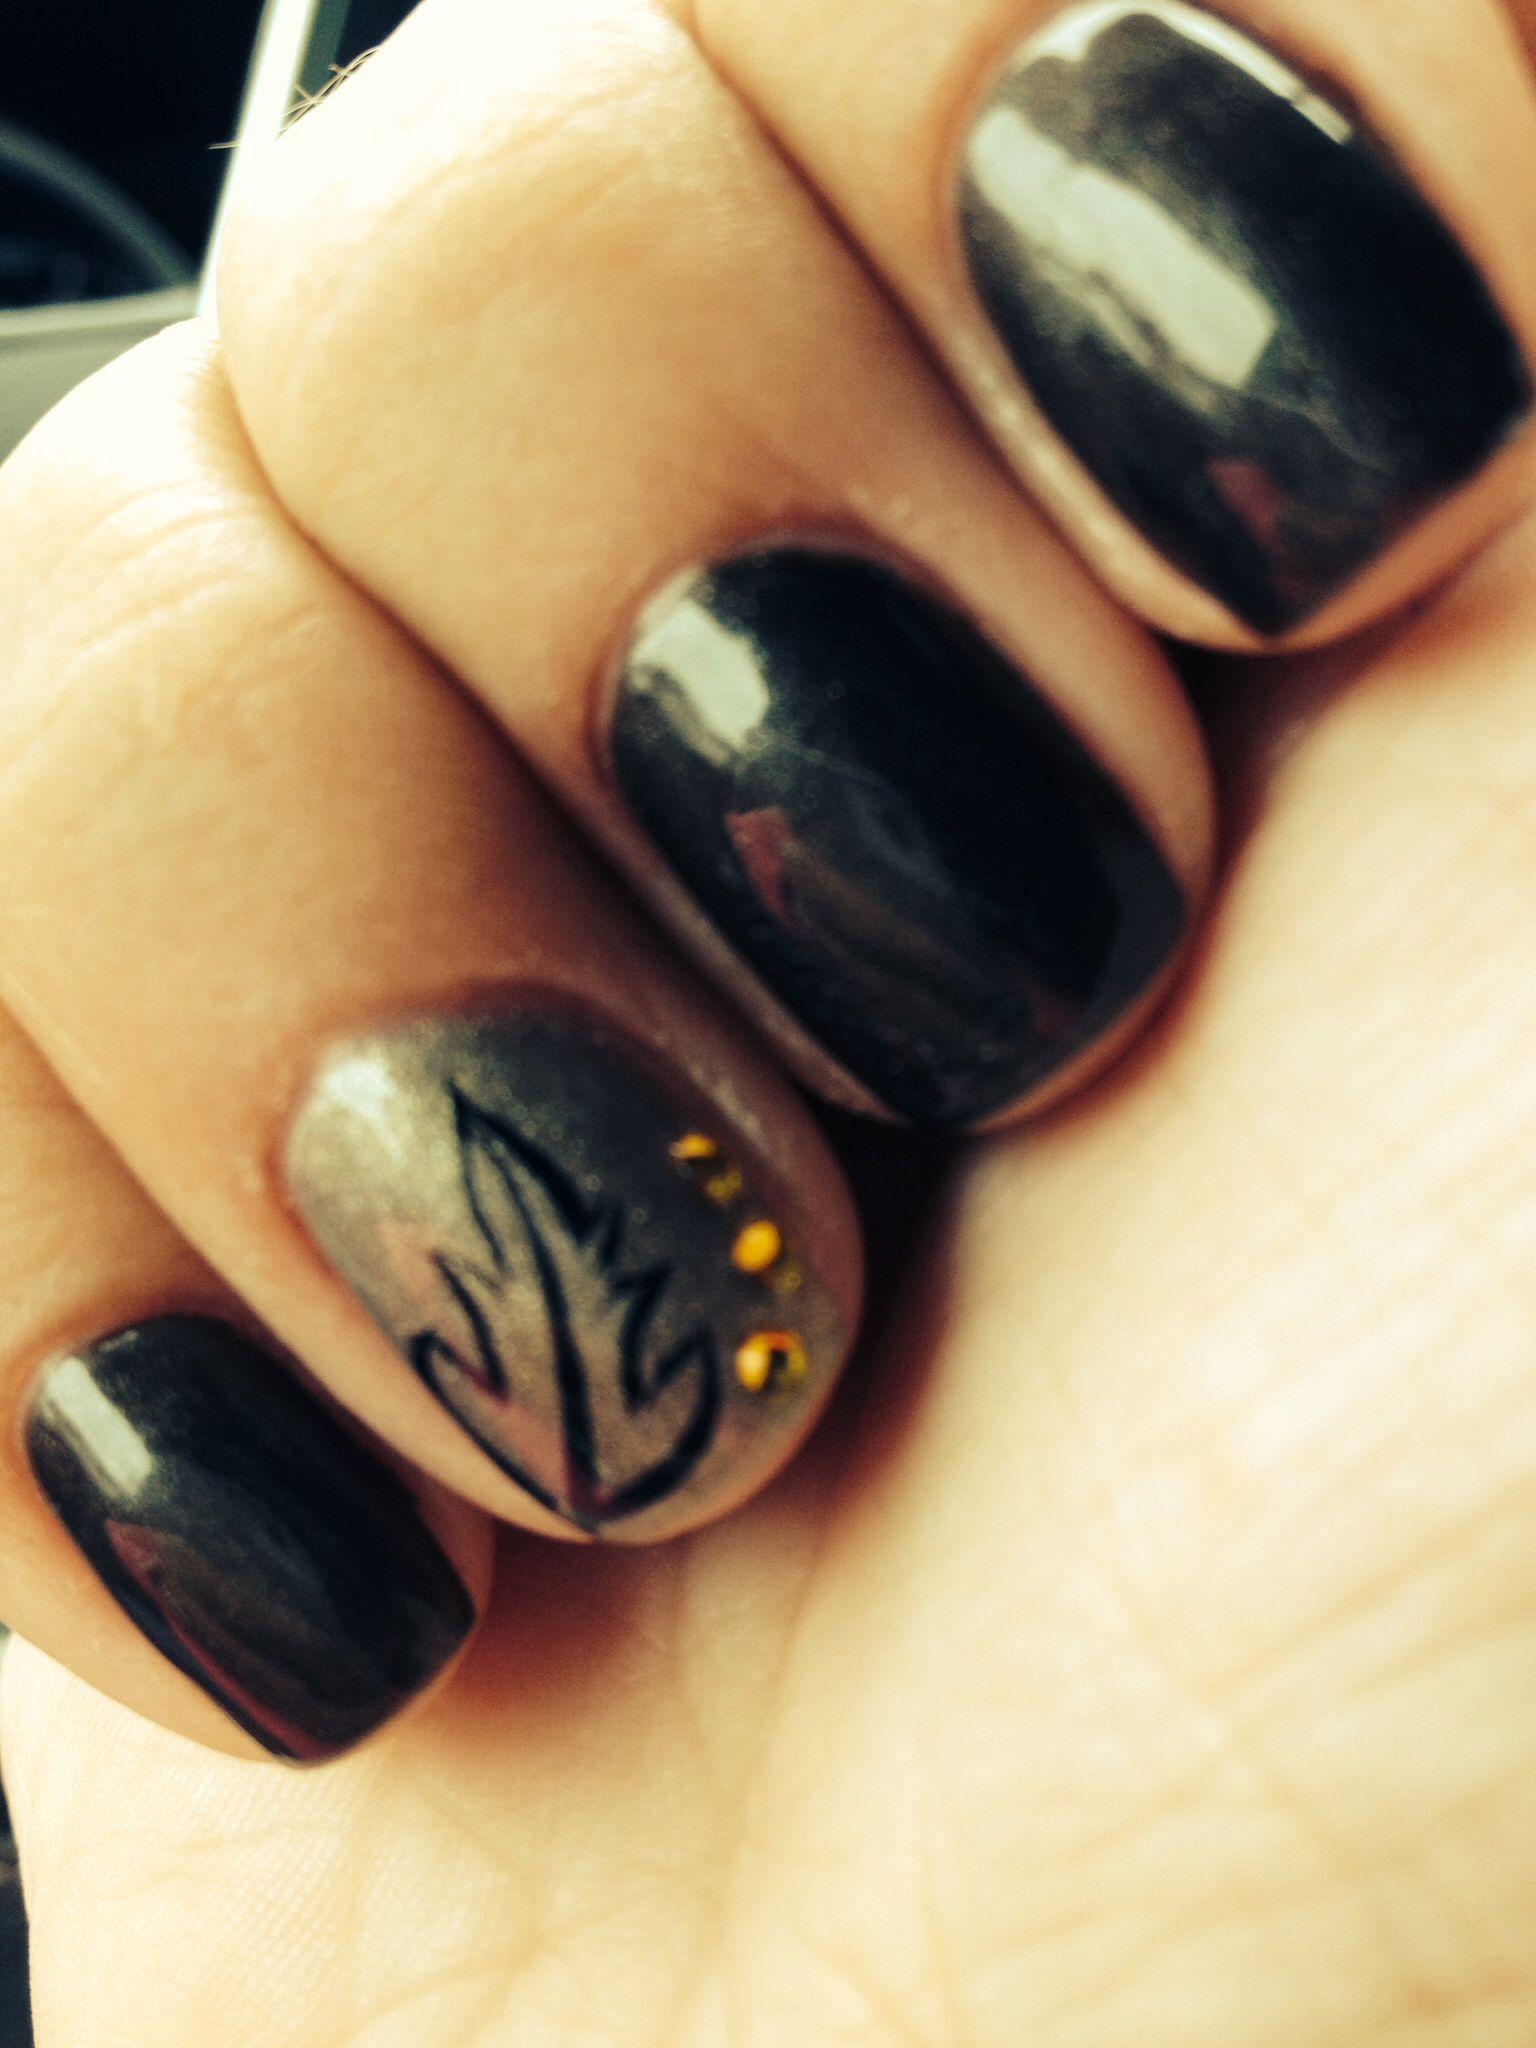 Fun Fall Nails | Nails | Pinterest | Makeup, Diy manicure and Hair ...